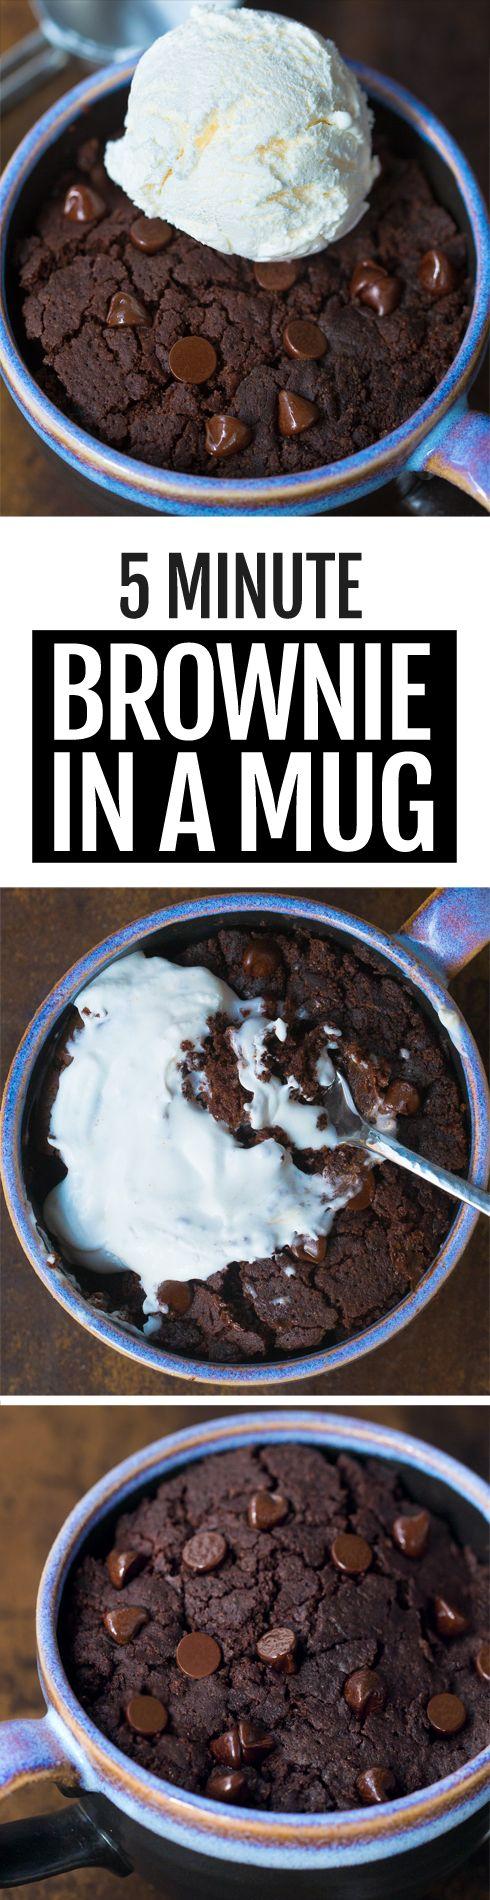 How To Make A Chocolate Brownie In A Mug (5 Minute Recipe)